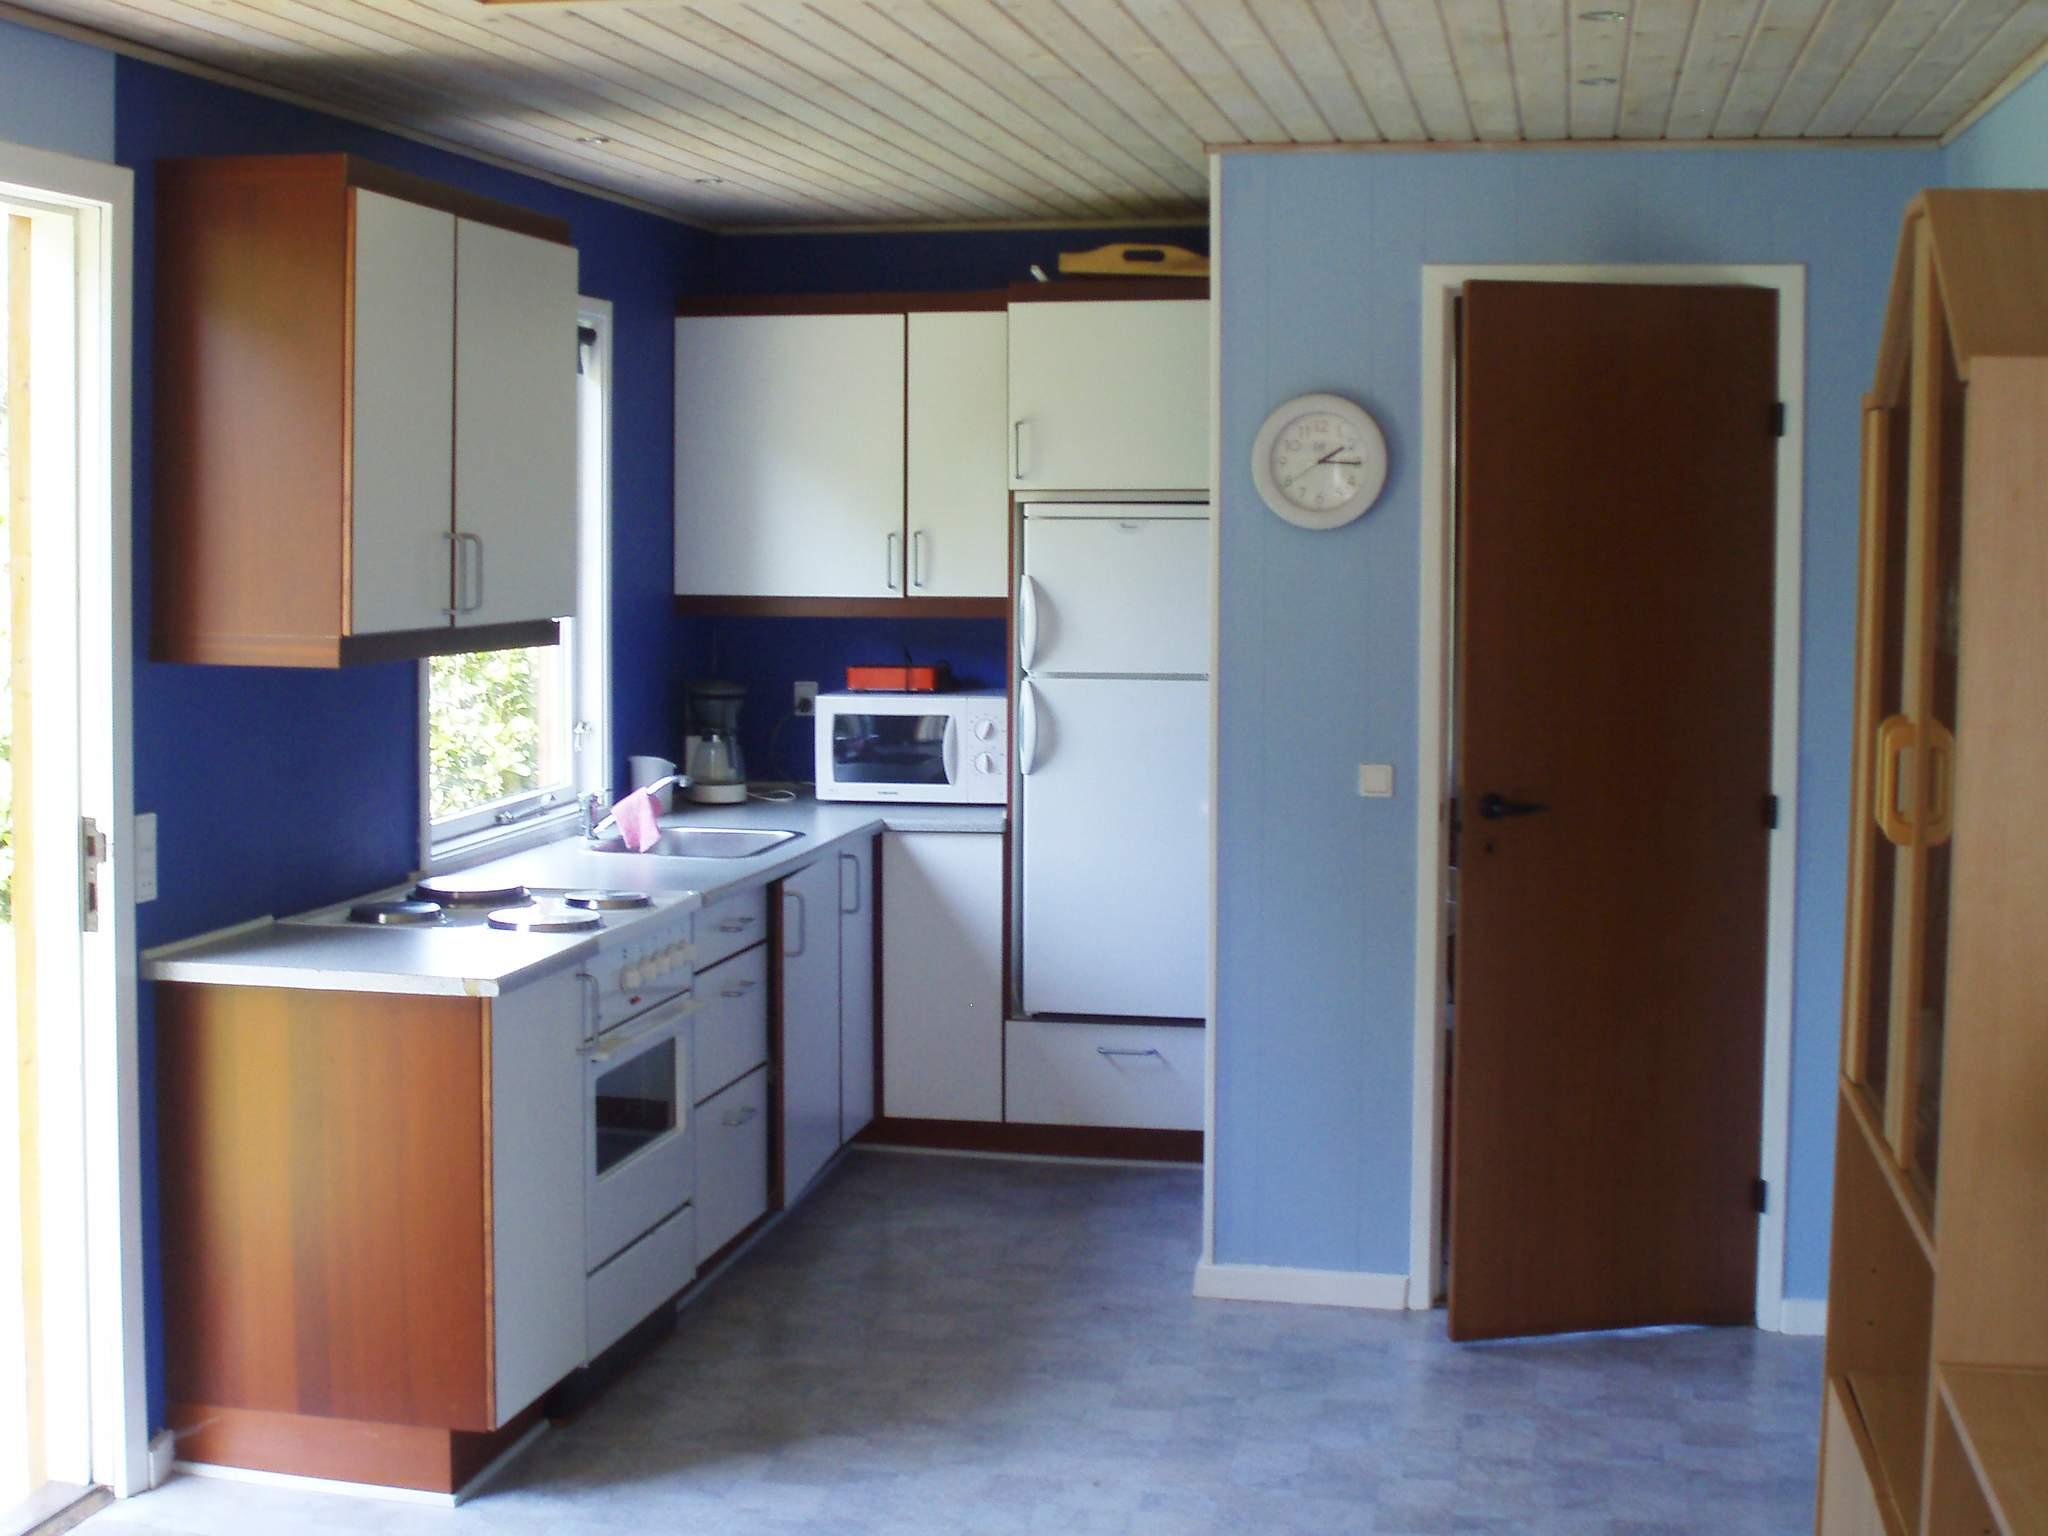 Ferienhaus Øster Hurup (86980), Øster Hurup, , Ostjütland, Dänemark, Bild 7